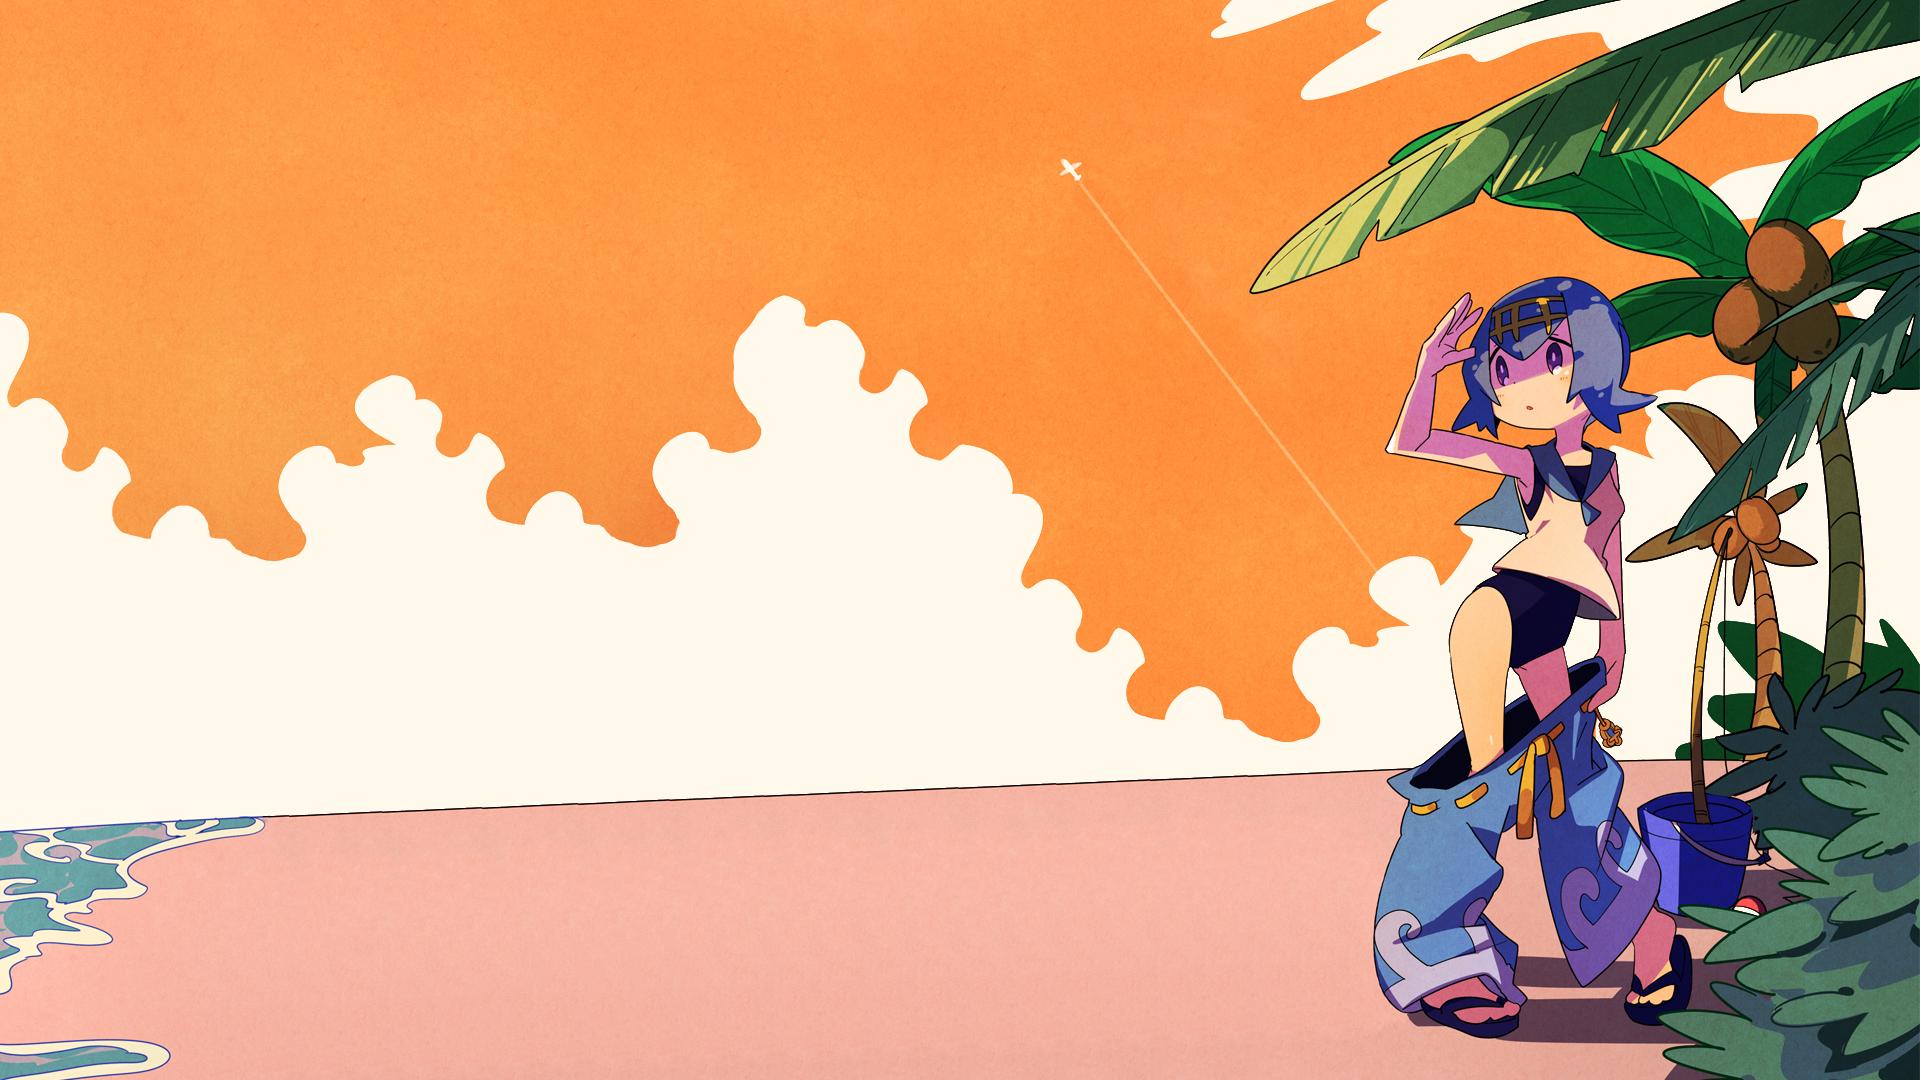 Wallpaper Pokemon Sea Orange Lana Suiren 1920x1080